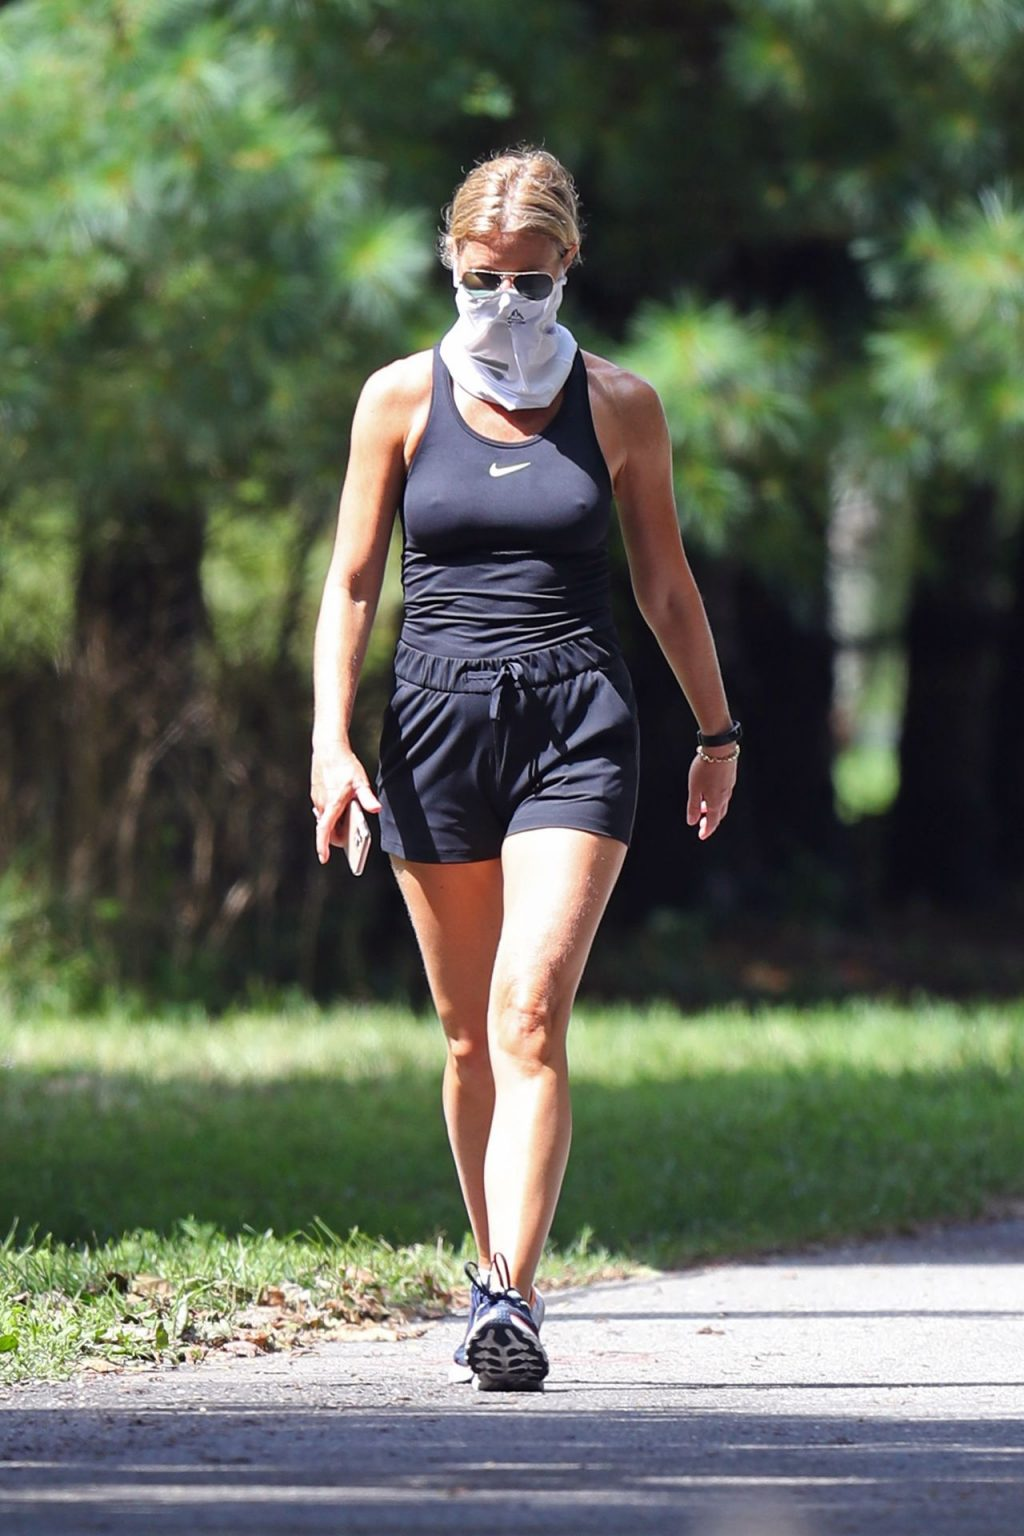 Gwyneth Paltrow Shows Her Pokies in The Hamptons (23 Photos)